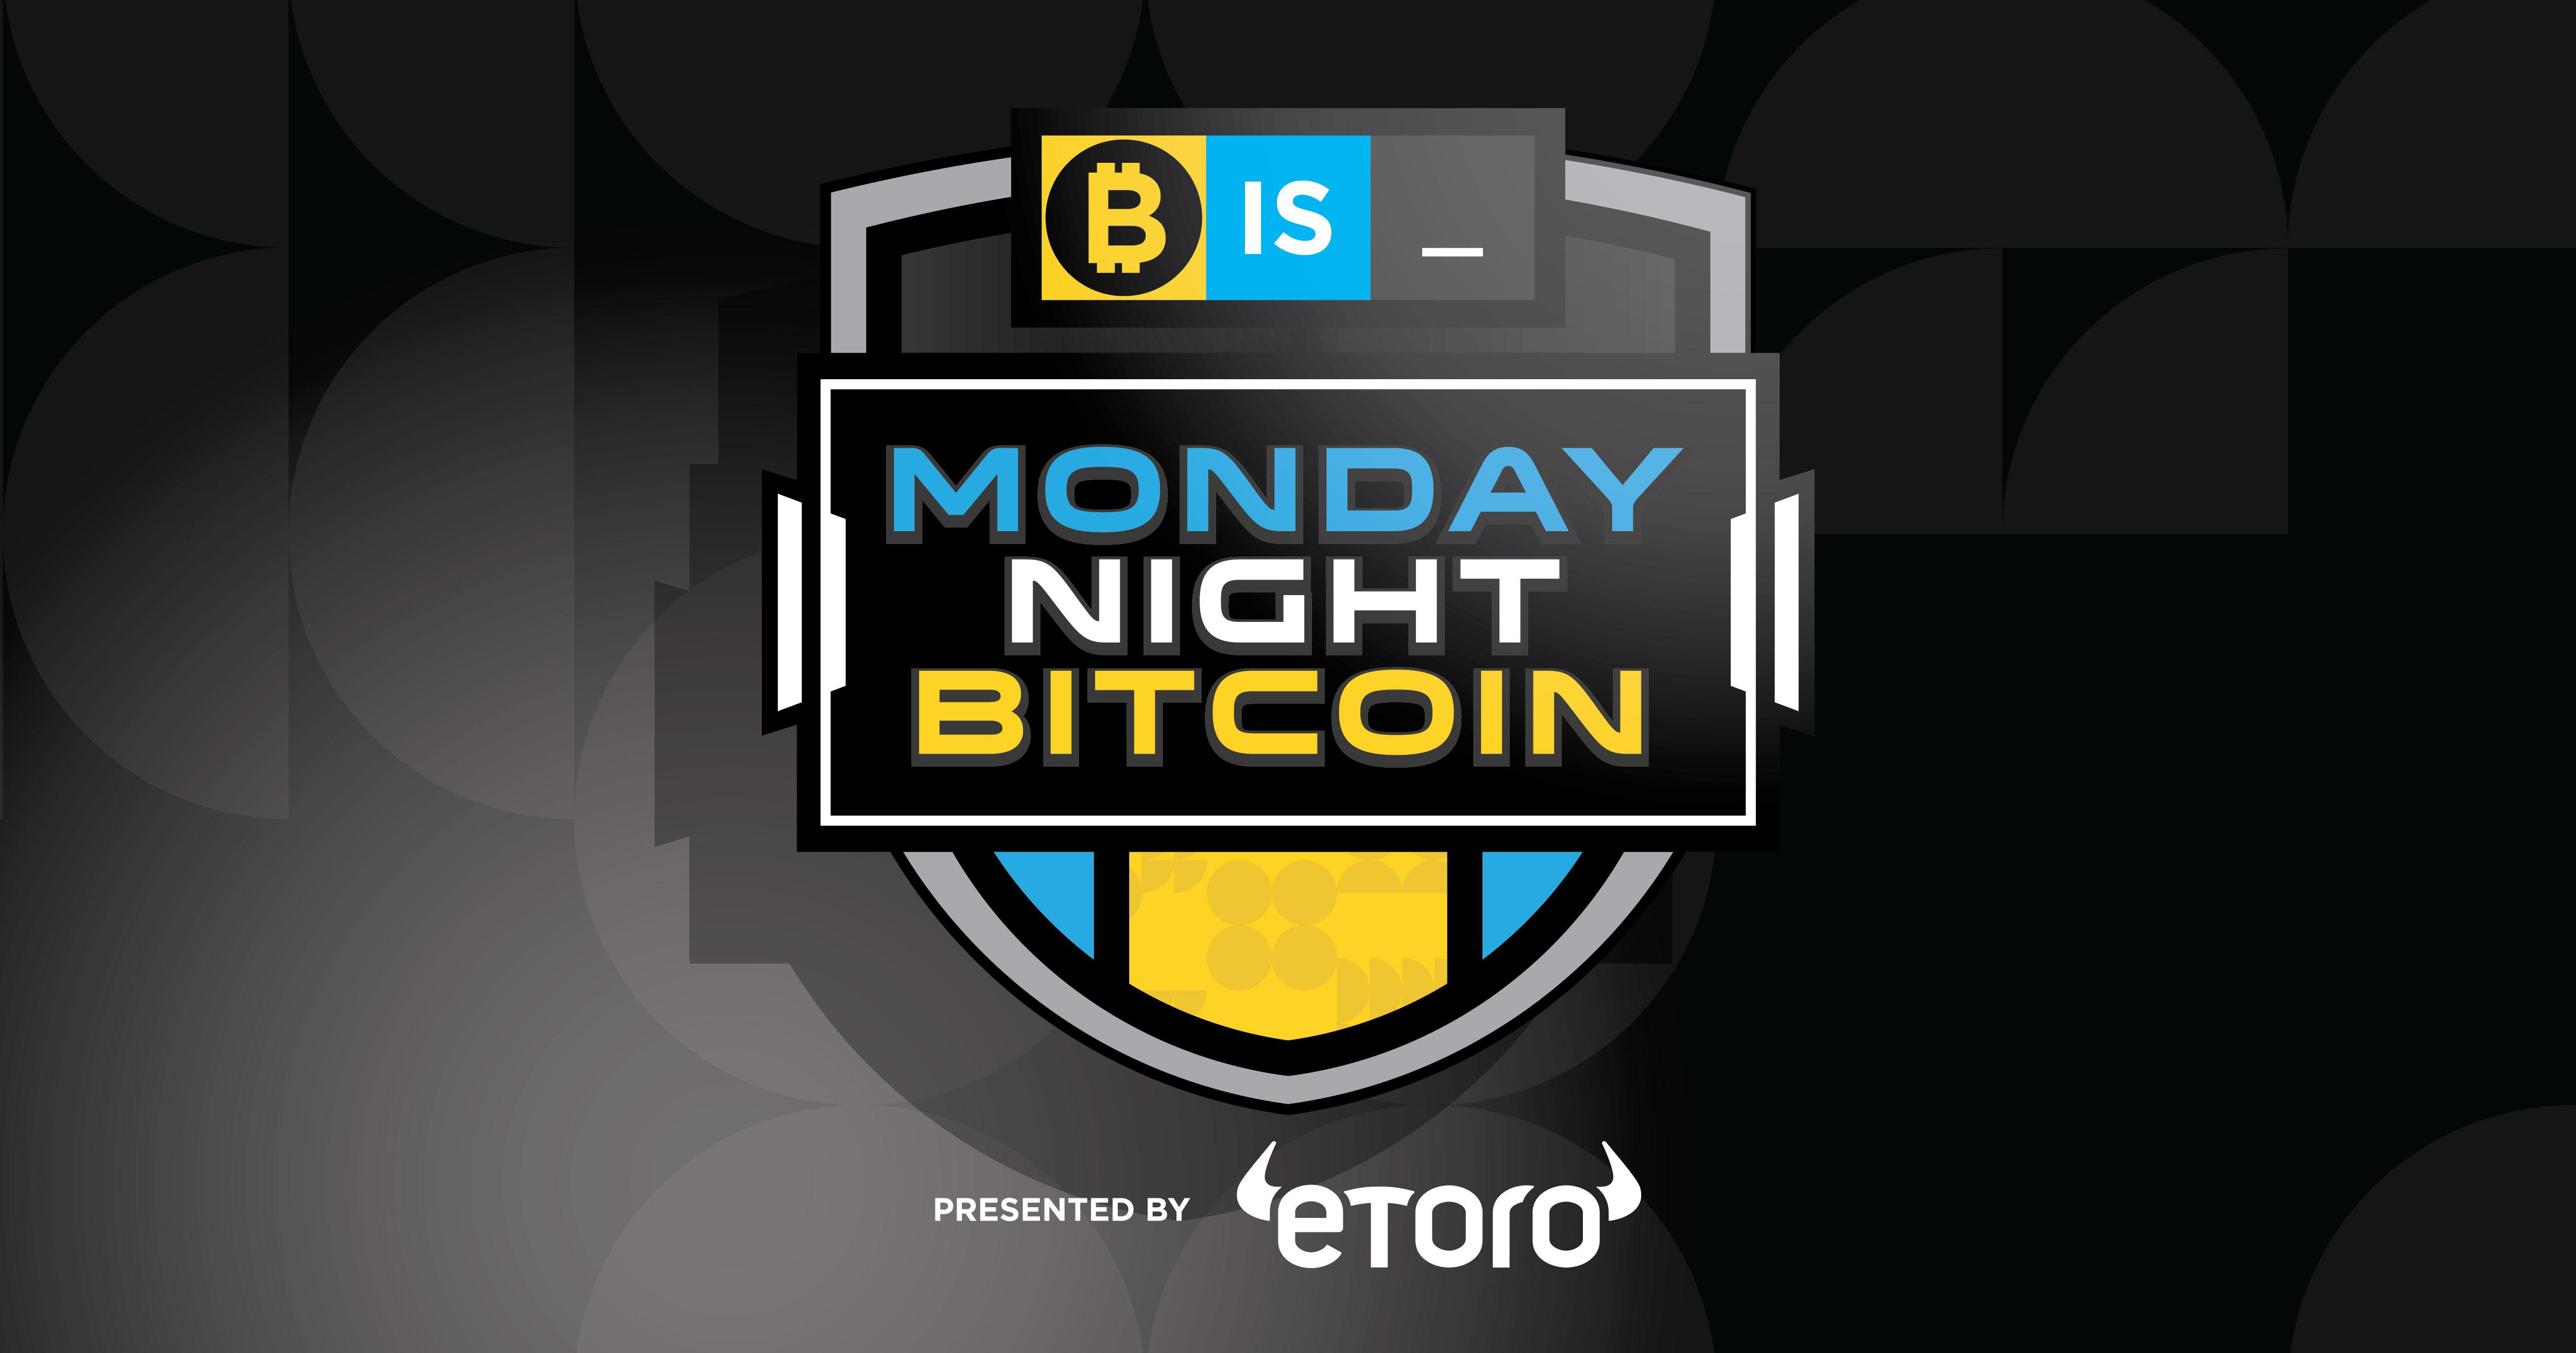 Monday Night Bitcoin Presented by eToro